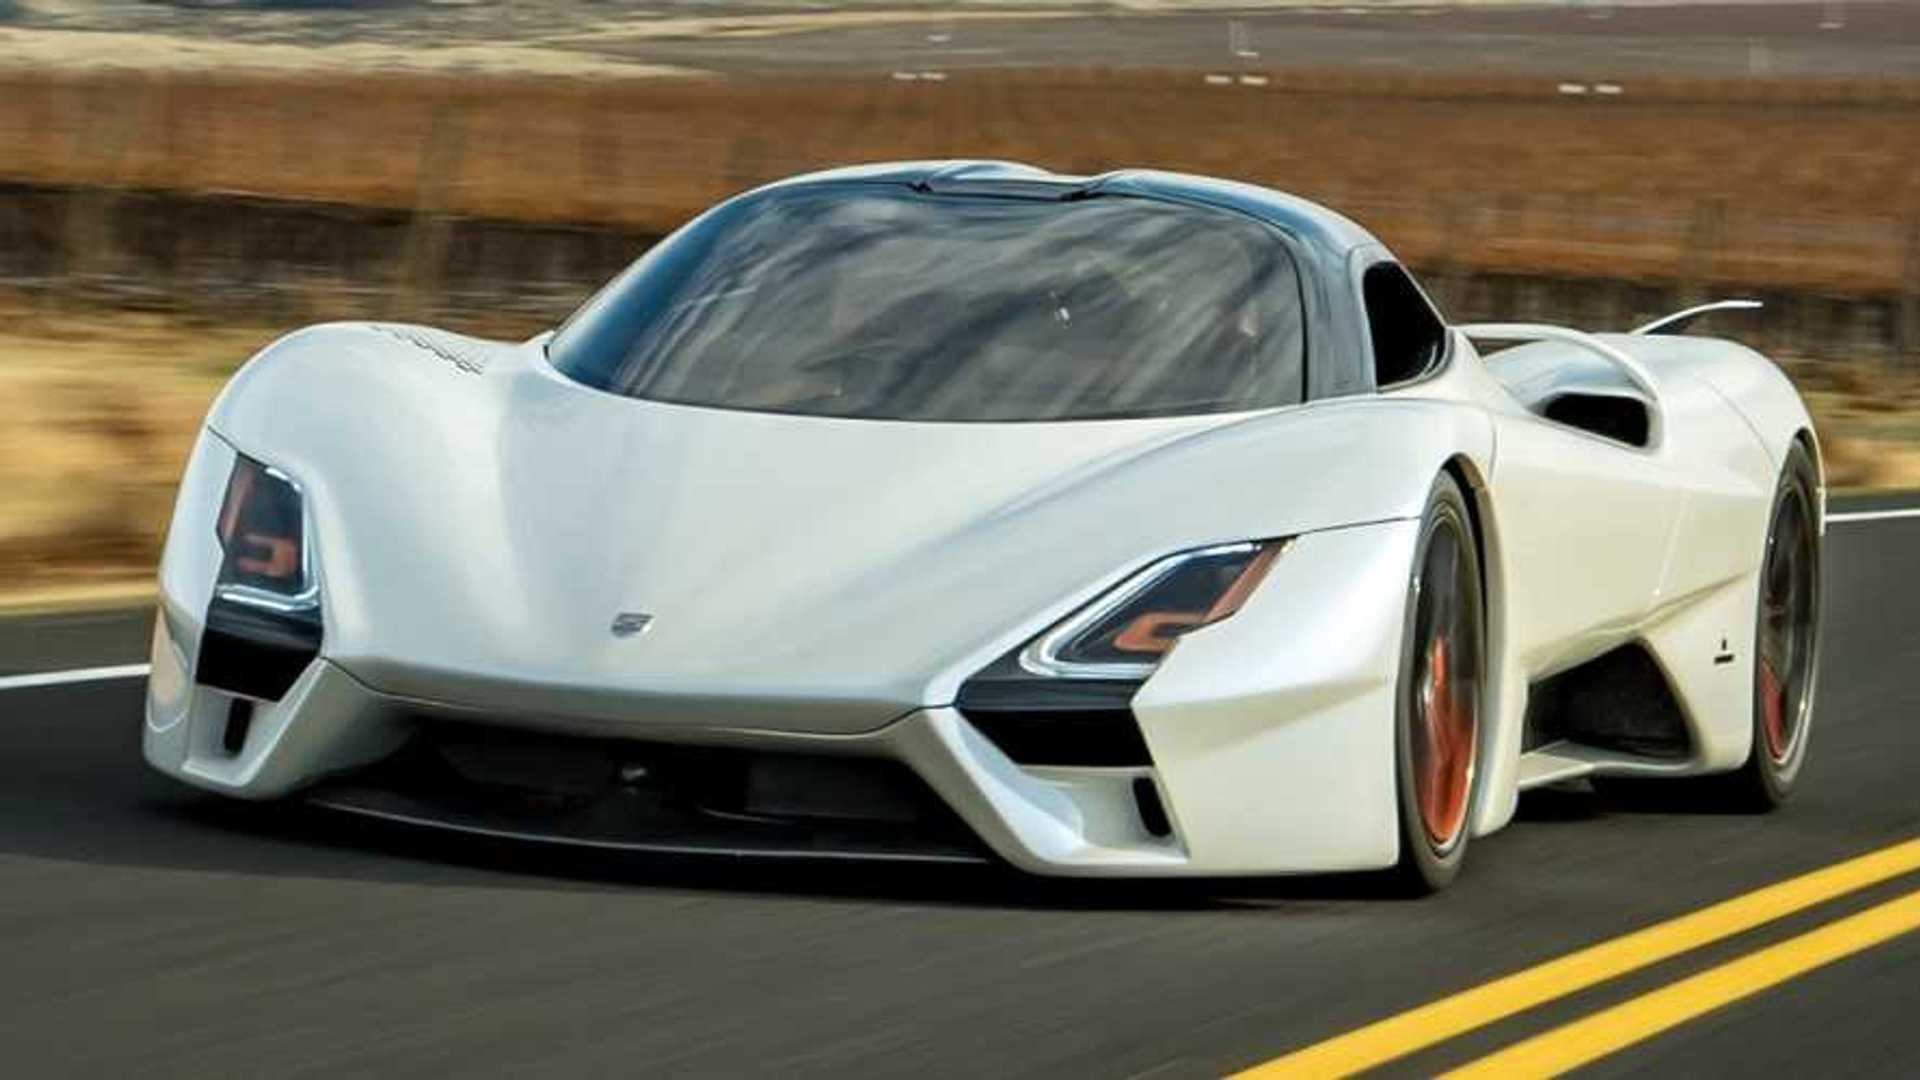 Fastest production car 2020